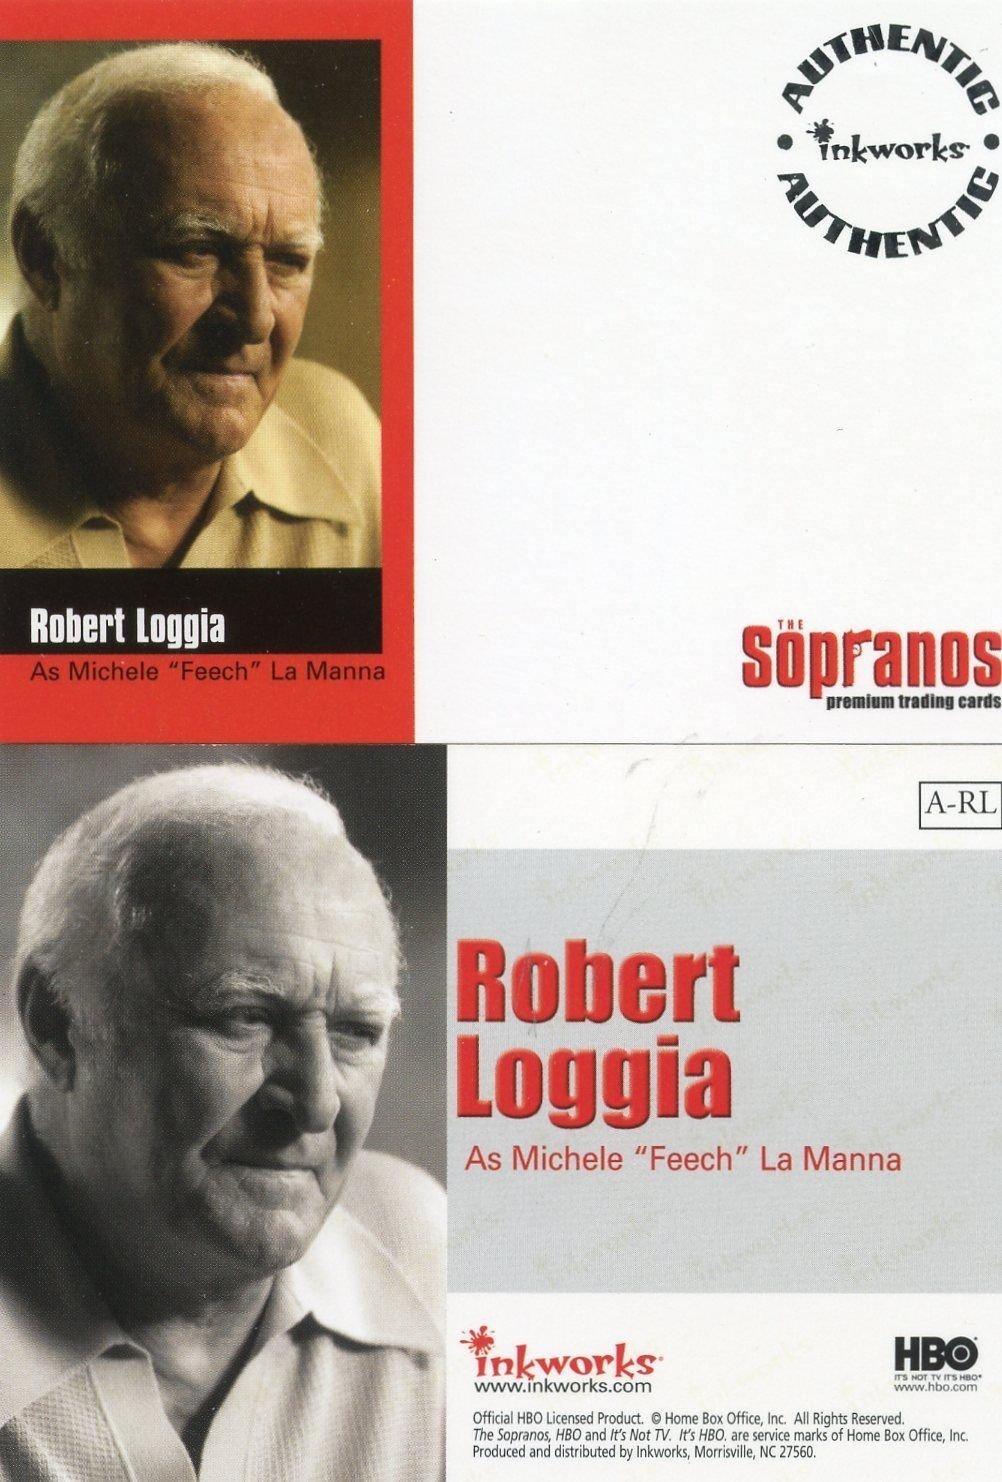 SOPRANOS UNSIGNED AUTOGRAPH CARD INKWORKS RARE TONY SIRICO PAULIE WALNUTS